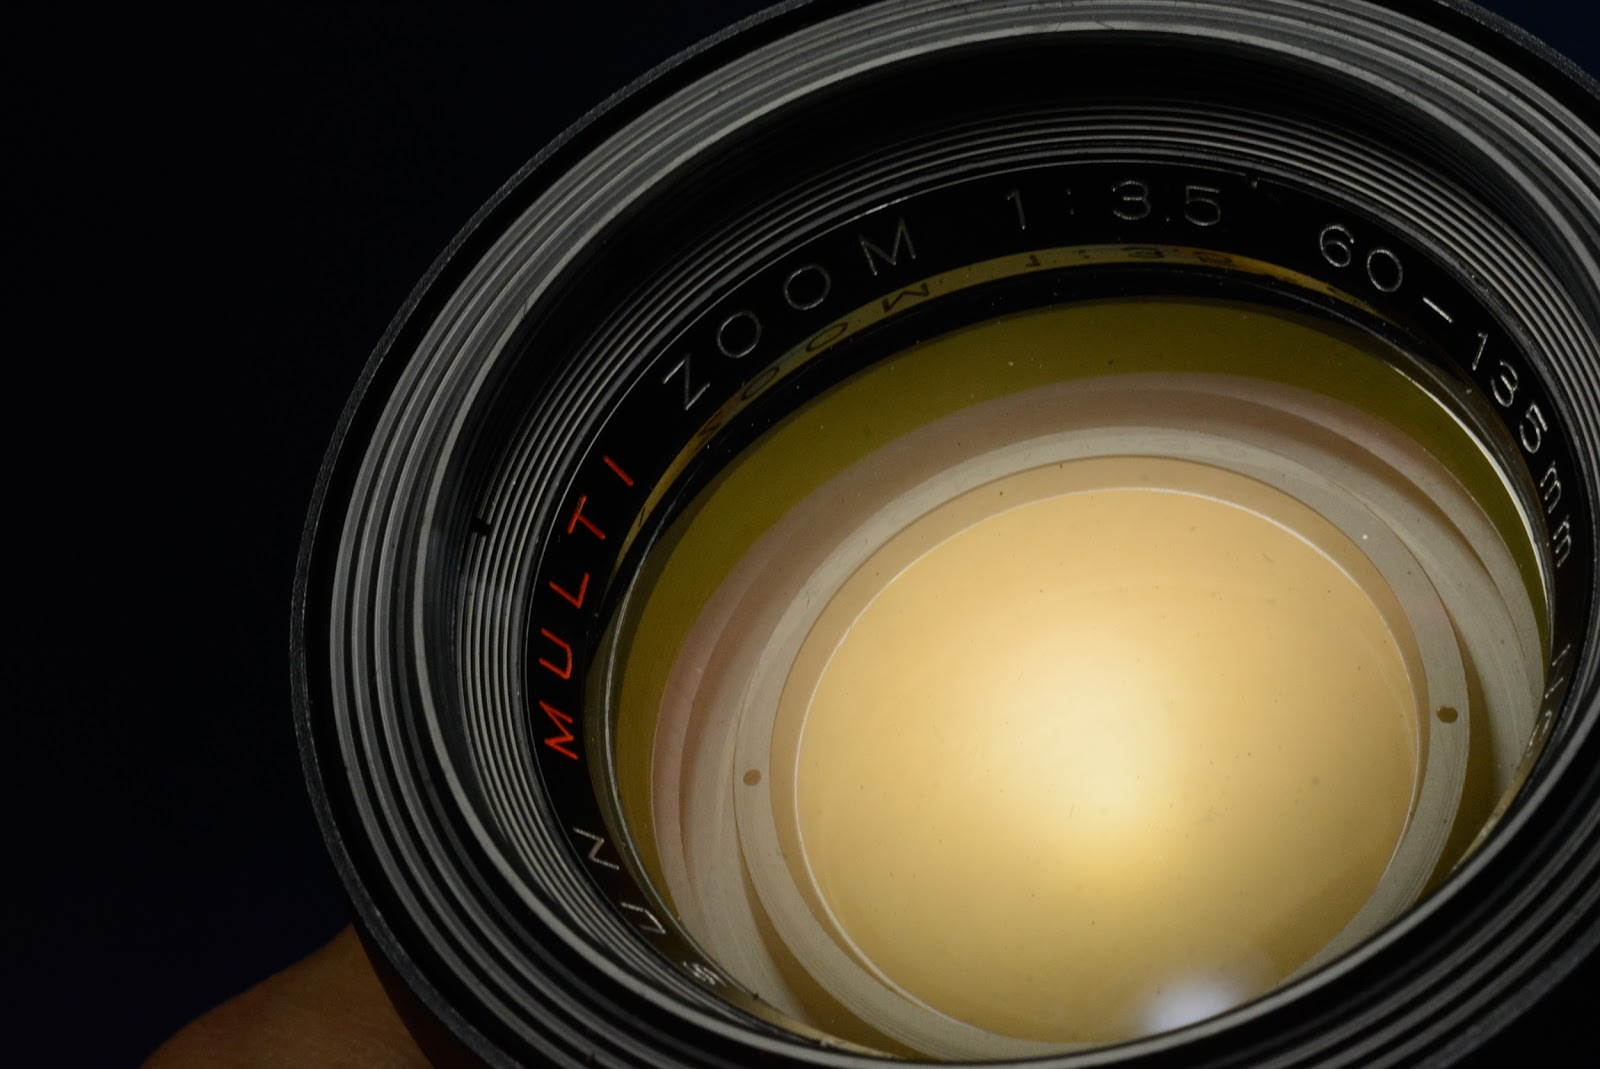 Sun Optical SUN MULTI ZOOM 60-135mm f/3.5 (YS/T-Mount)